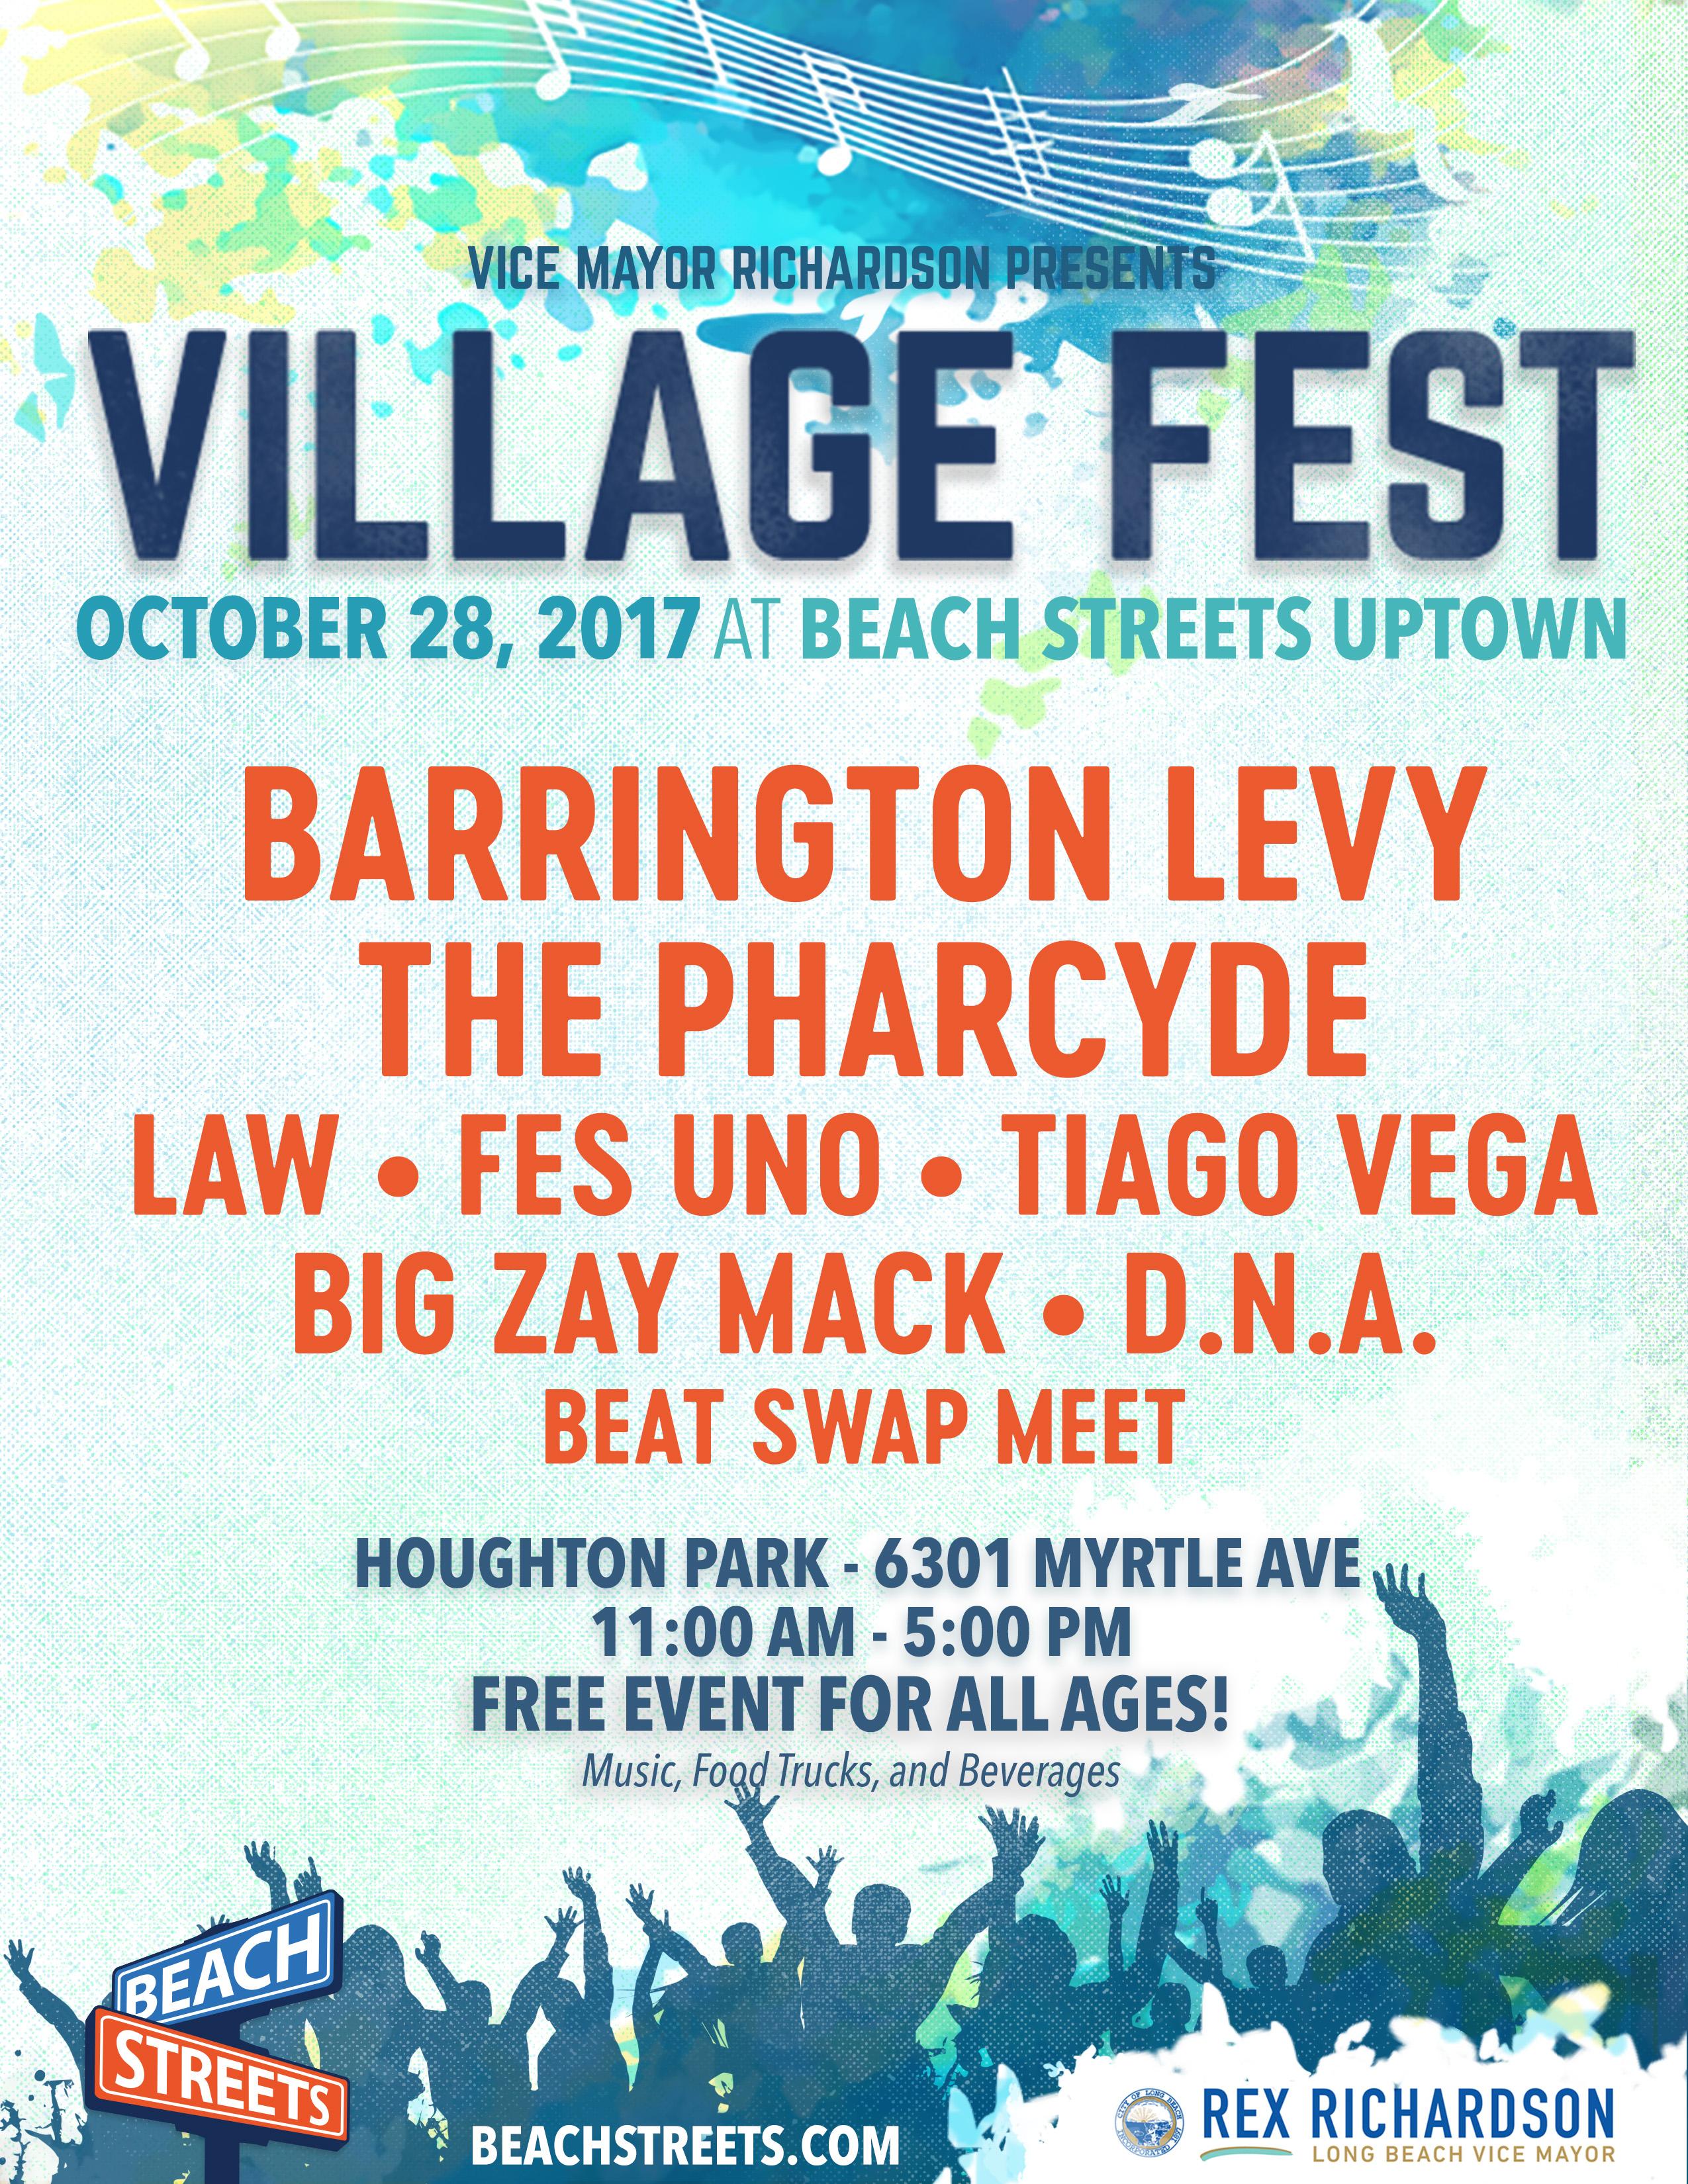 Village_Fest_Lineup_10.28.17.jpg